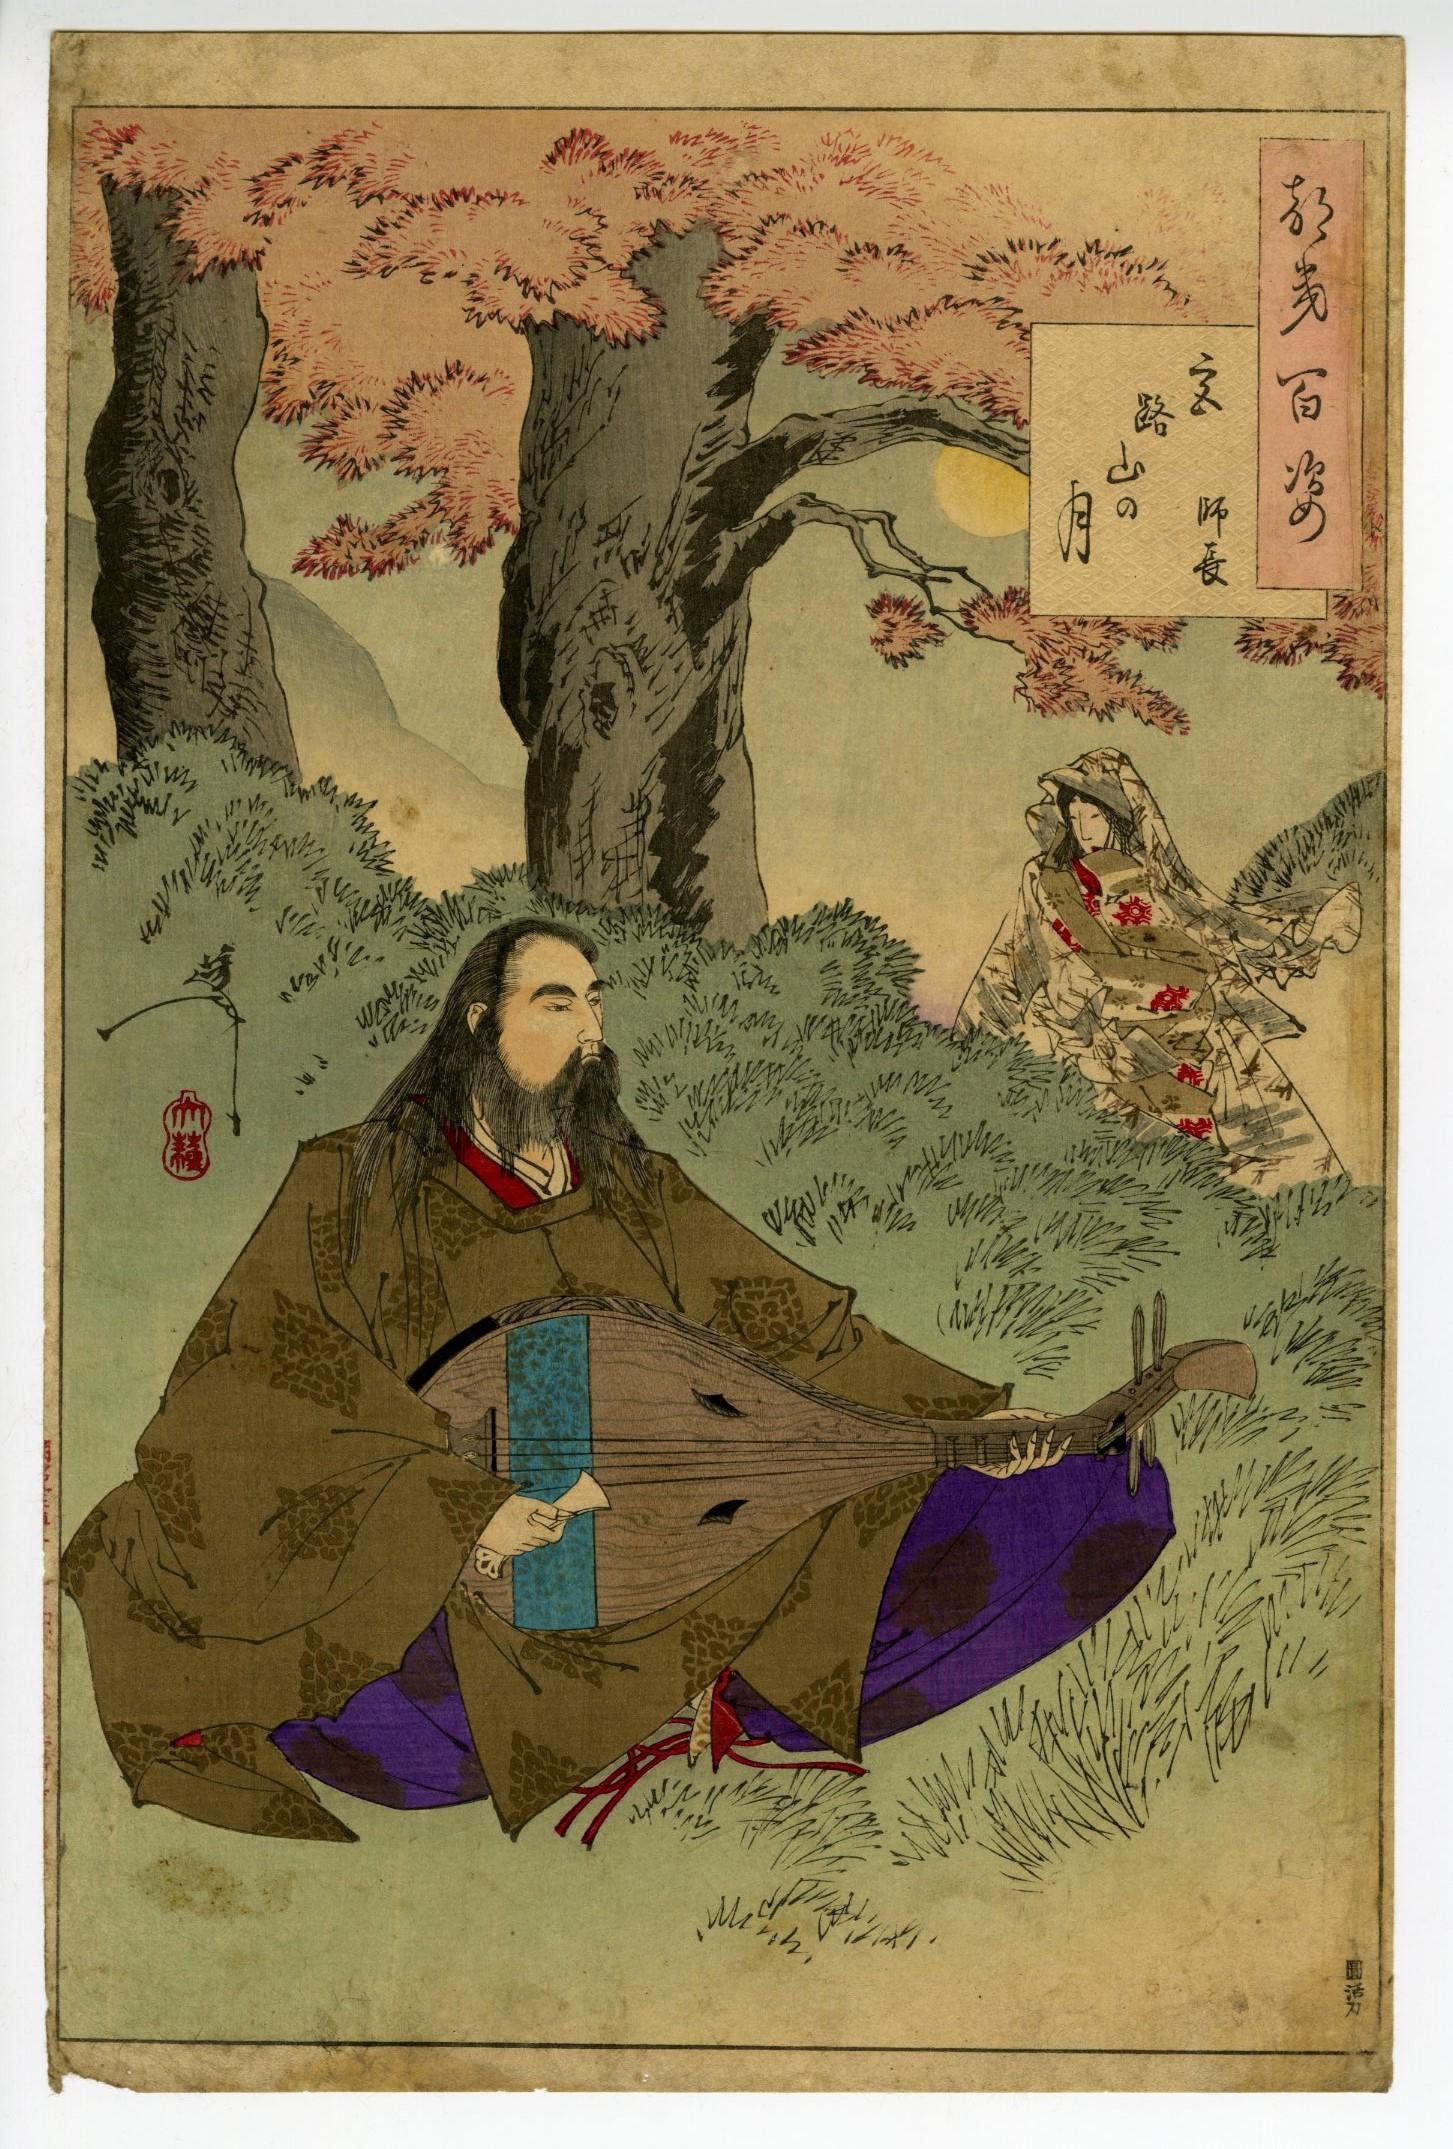 Yoshitoshi - One Hundred Aspects of the Moon, Fujiwara no